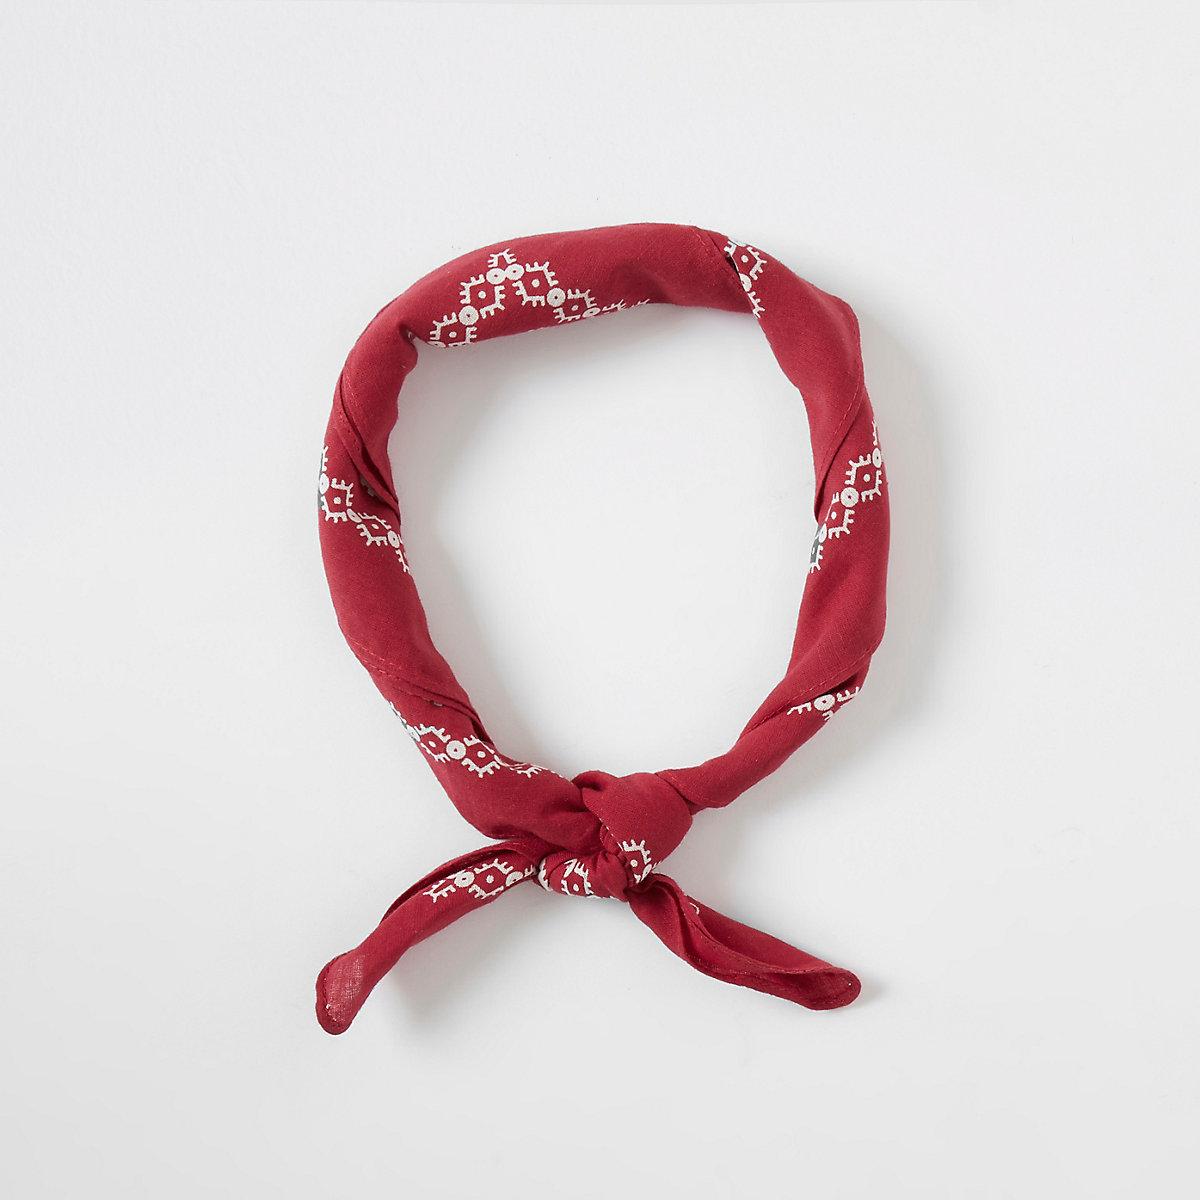 Levi's red bandana